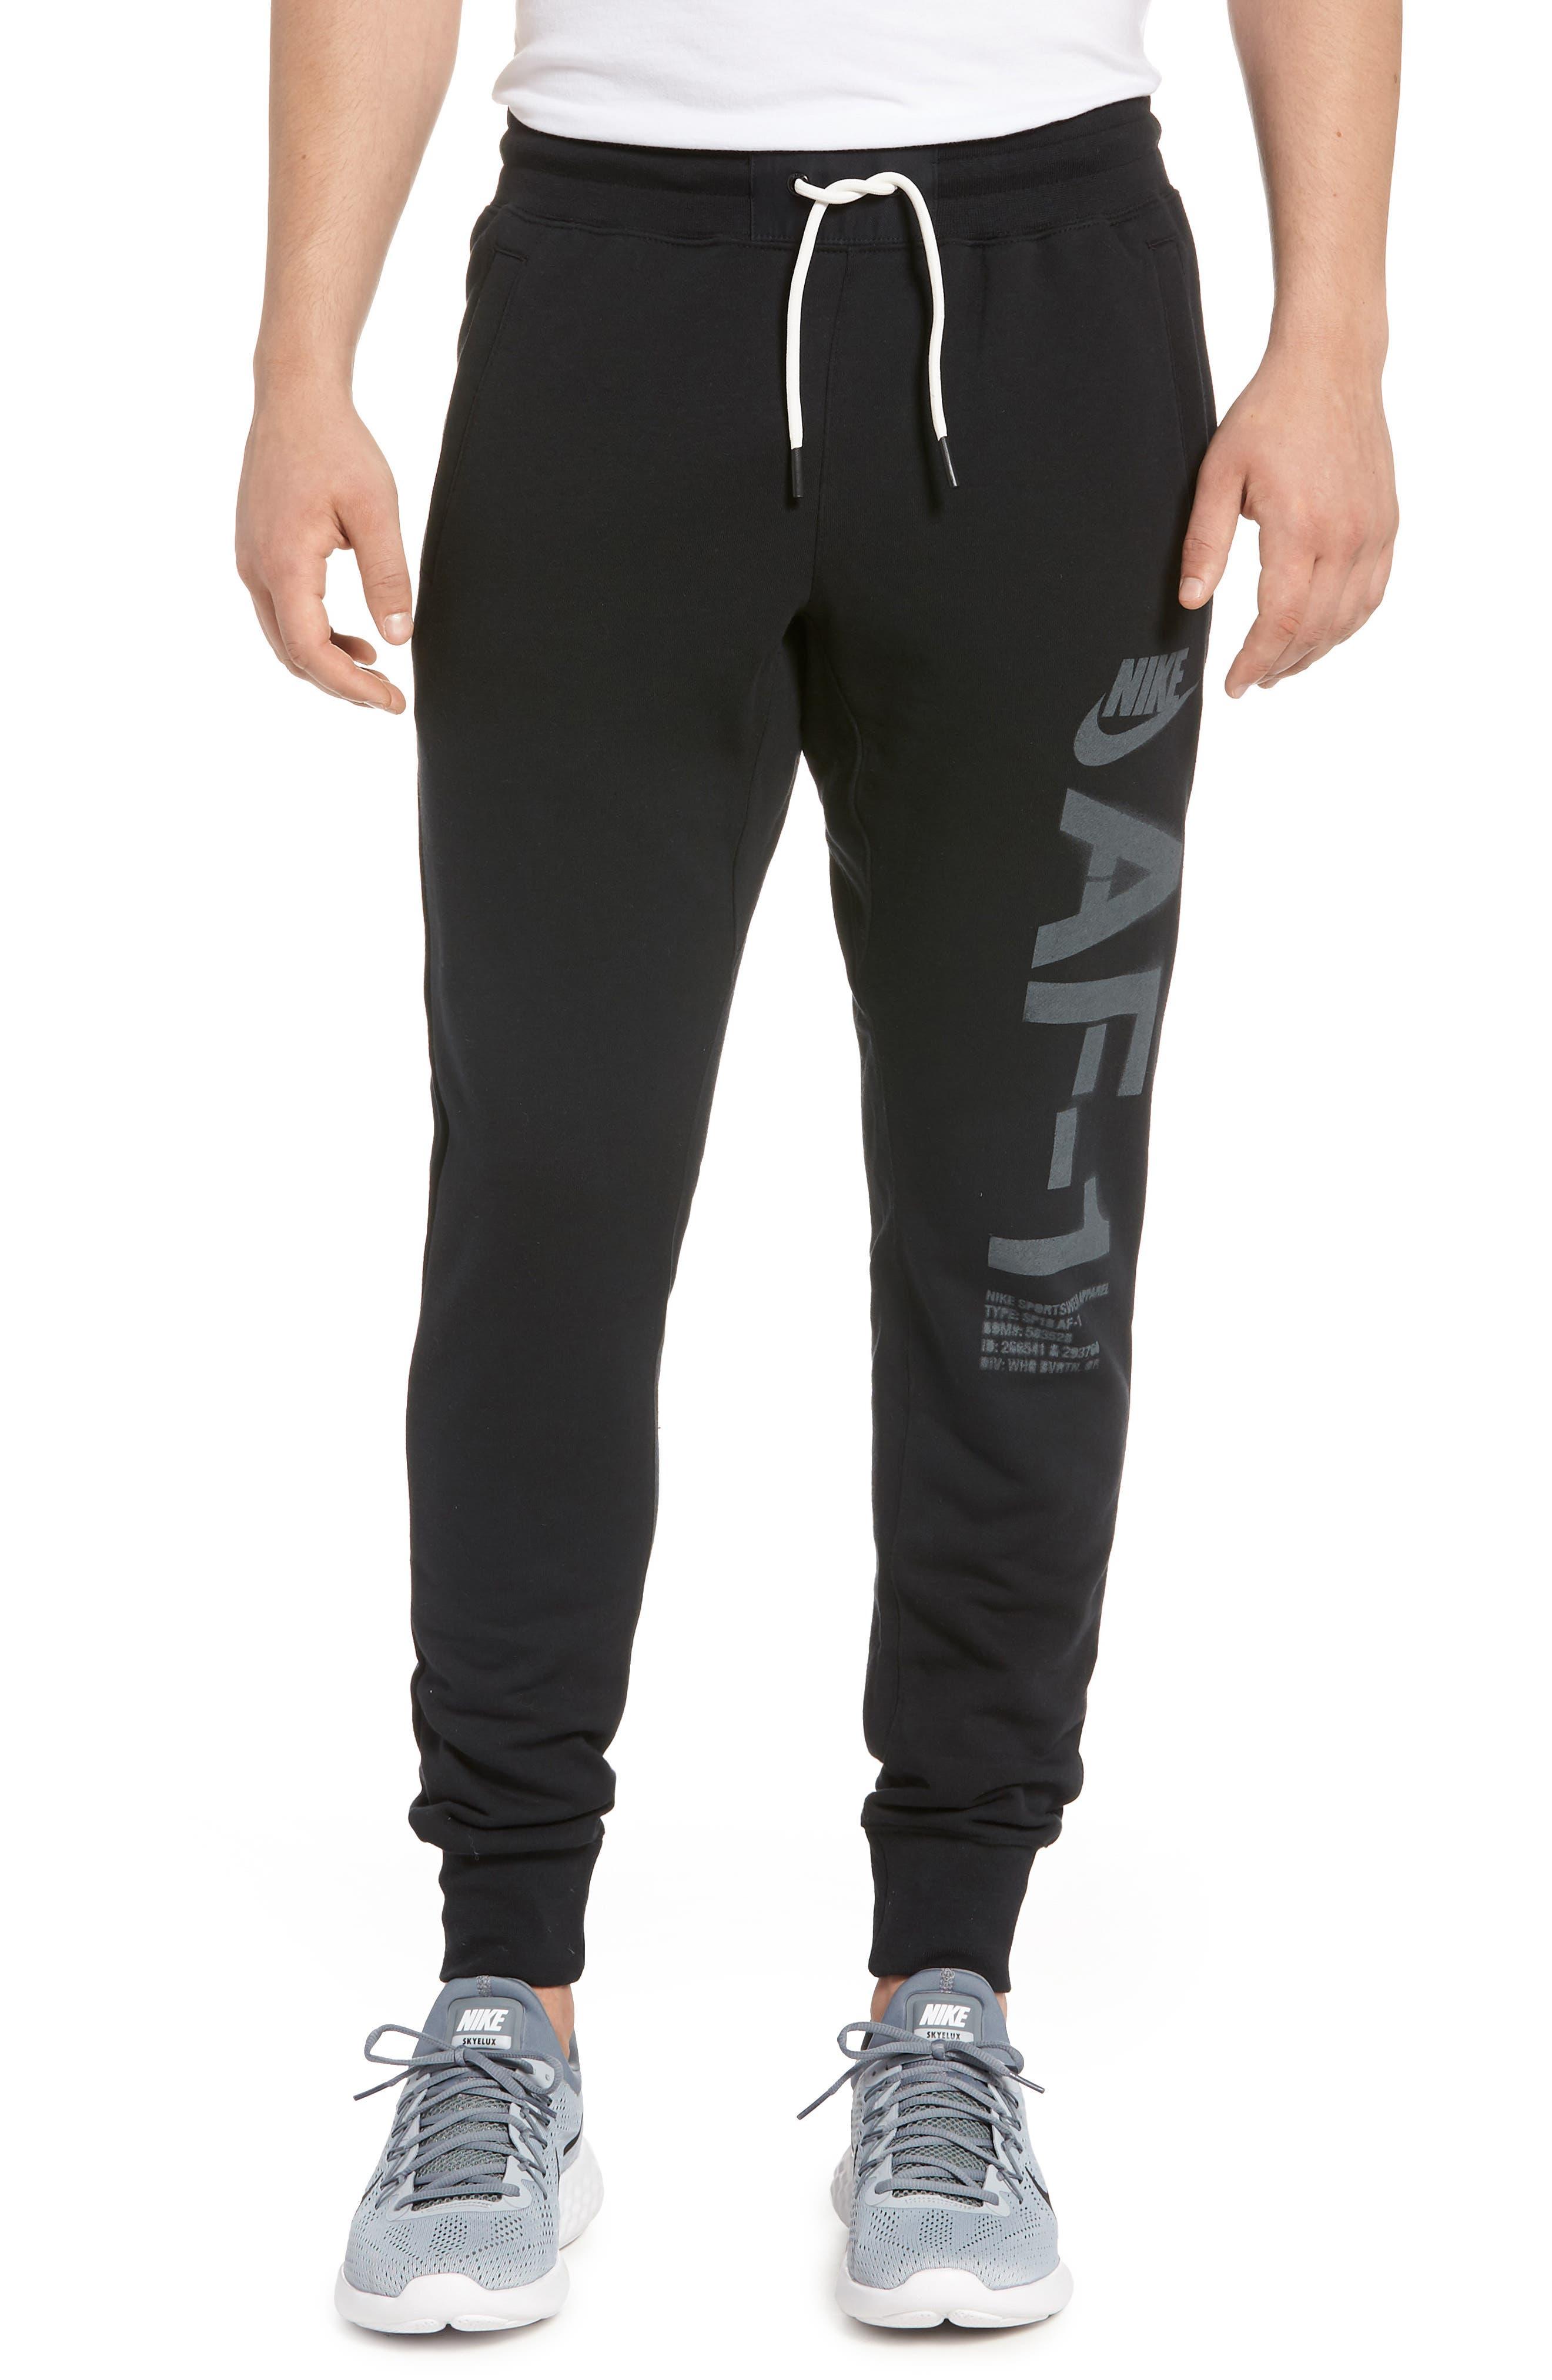 Sportswear Air Force 1 Jogger Pants,                             Main thumbnail 1, color,                             BLACK/ ANTHRACITE